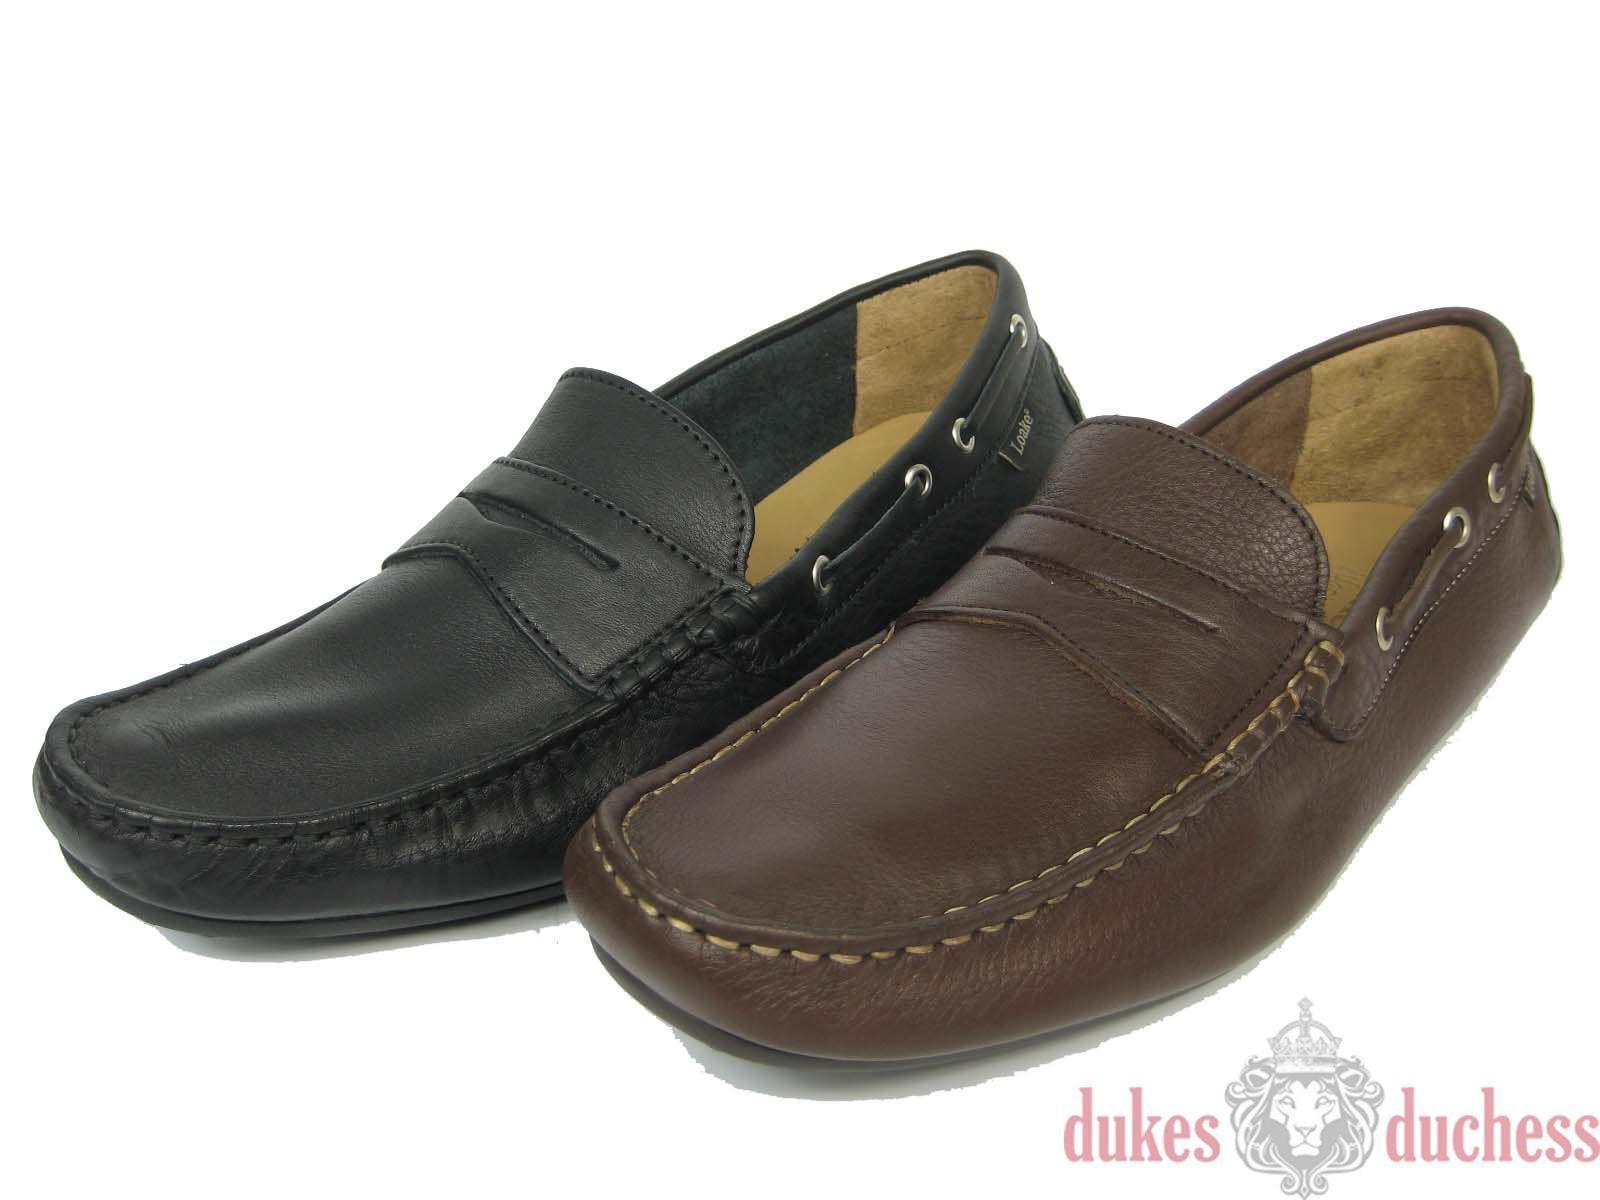 LOAKE Lifestyle HEALEY Uomo Pelle Loafer mocassino pantofola nero/Marrone 40-47